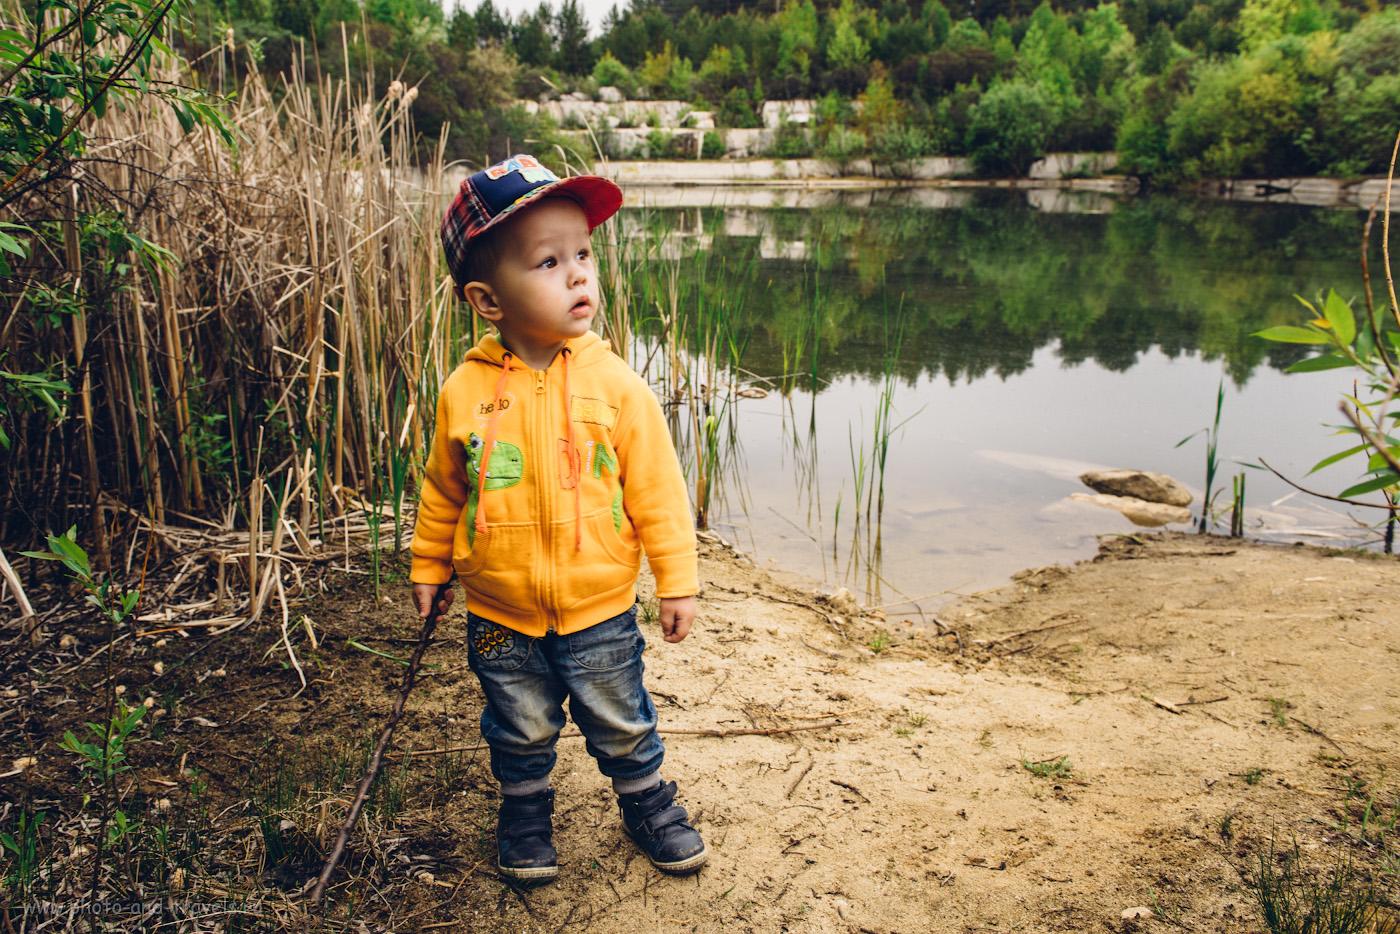 Пример съемки портрета на природе с освещением от одной Yongnuo YN-685 с белым зонтом на просвет. Фотоаппарат Nikon D610 + Nikon 24-70mm f/2.8G. Настройки: 1/60, 5.6, 160, 24.